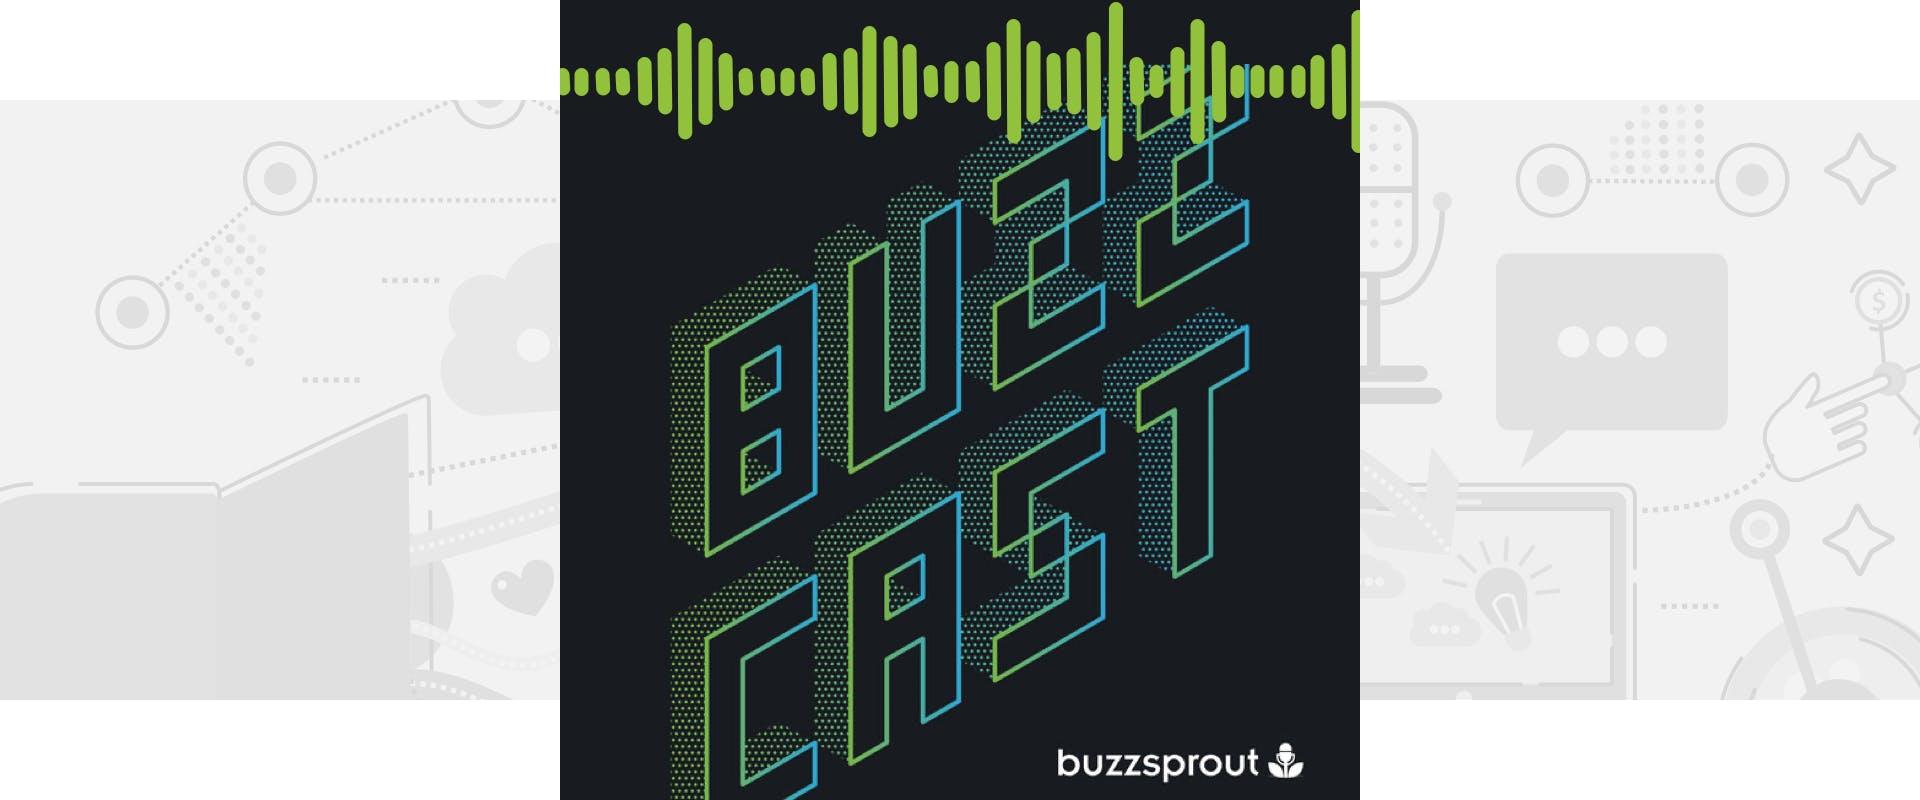 Buzzsprout Visual Soundbite